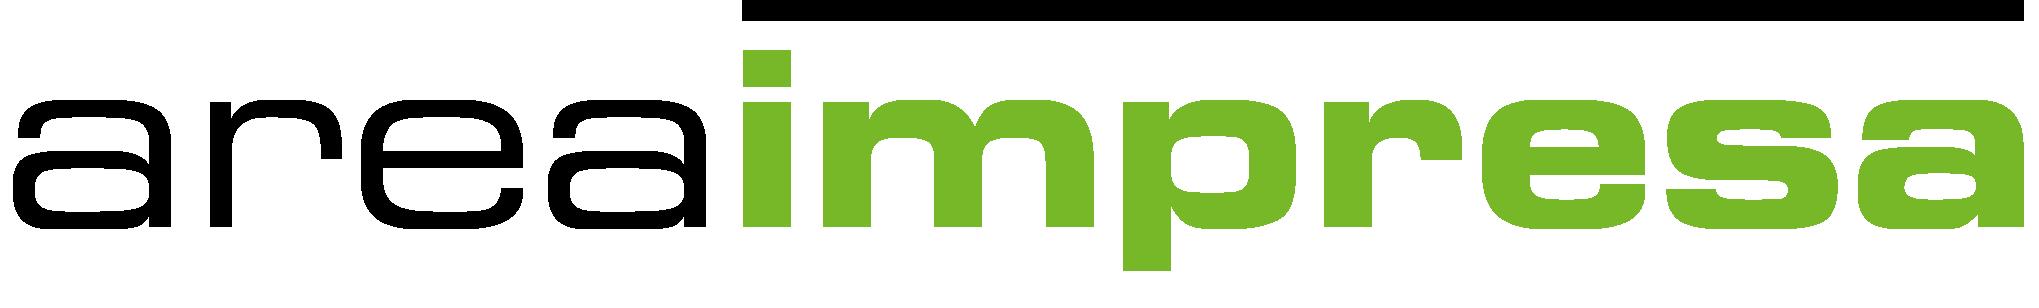 logo-area-impresa_nero-verde